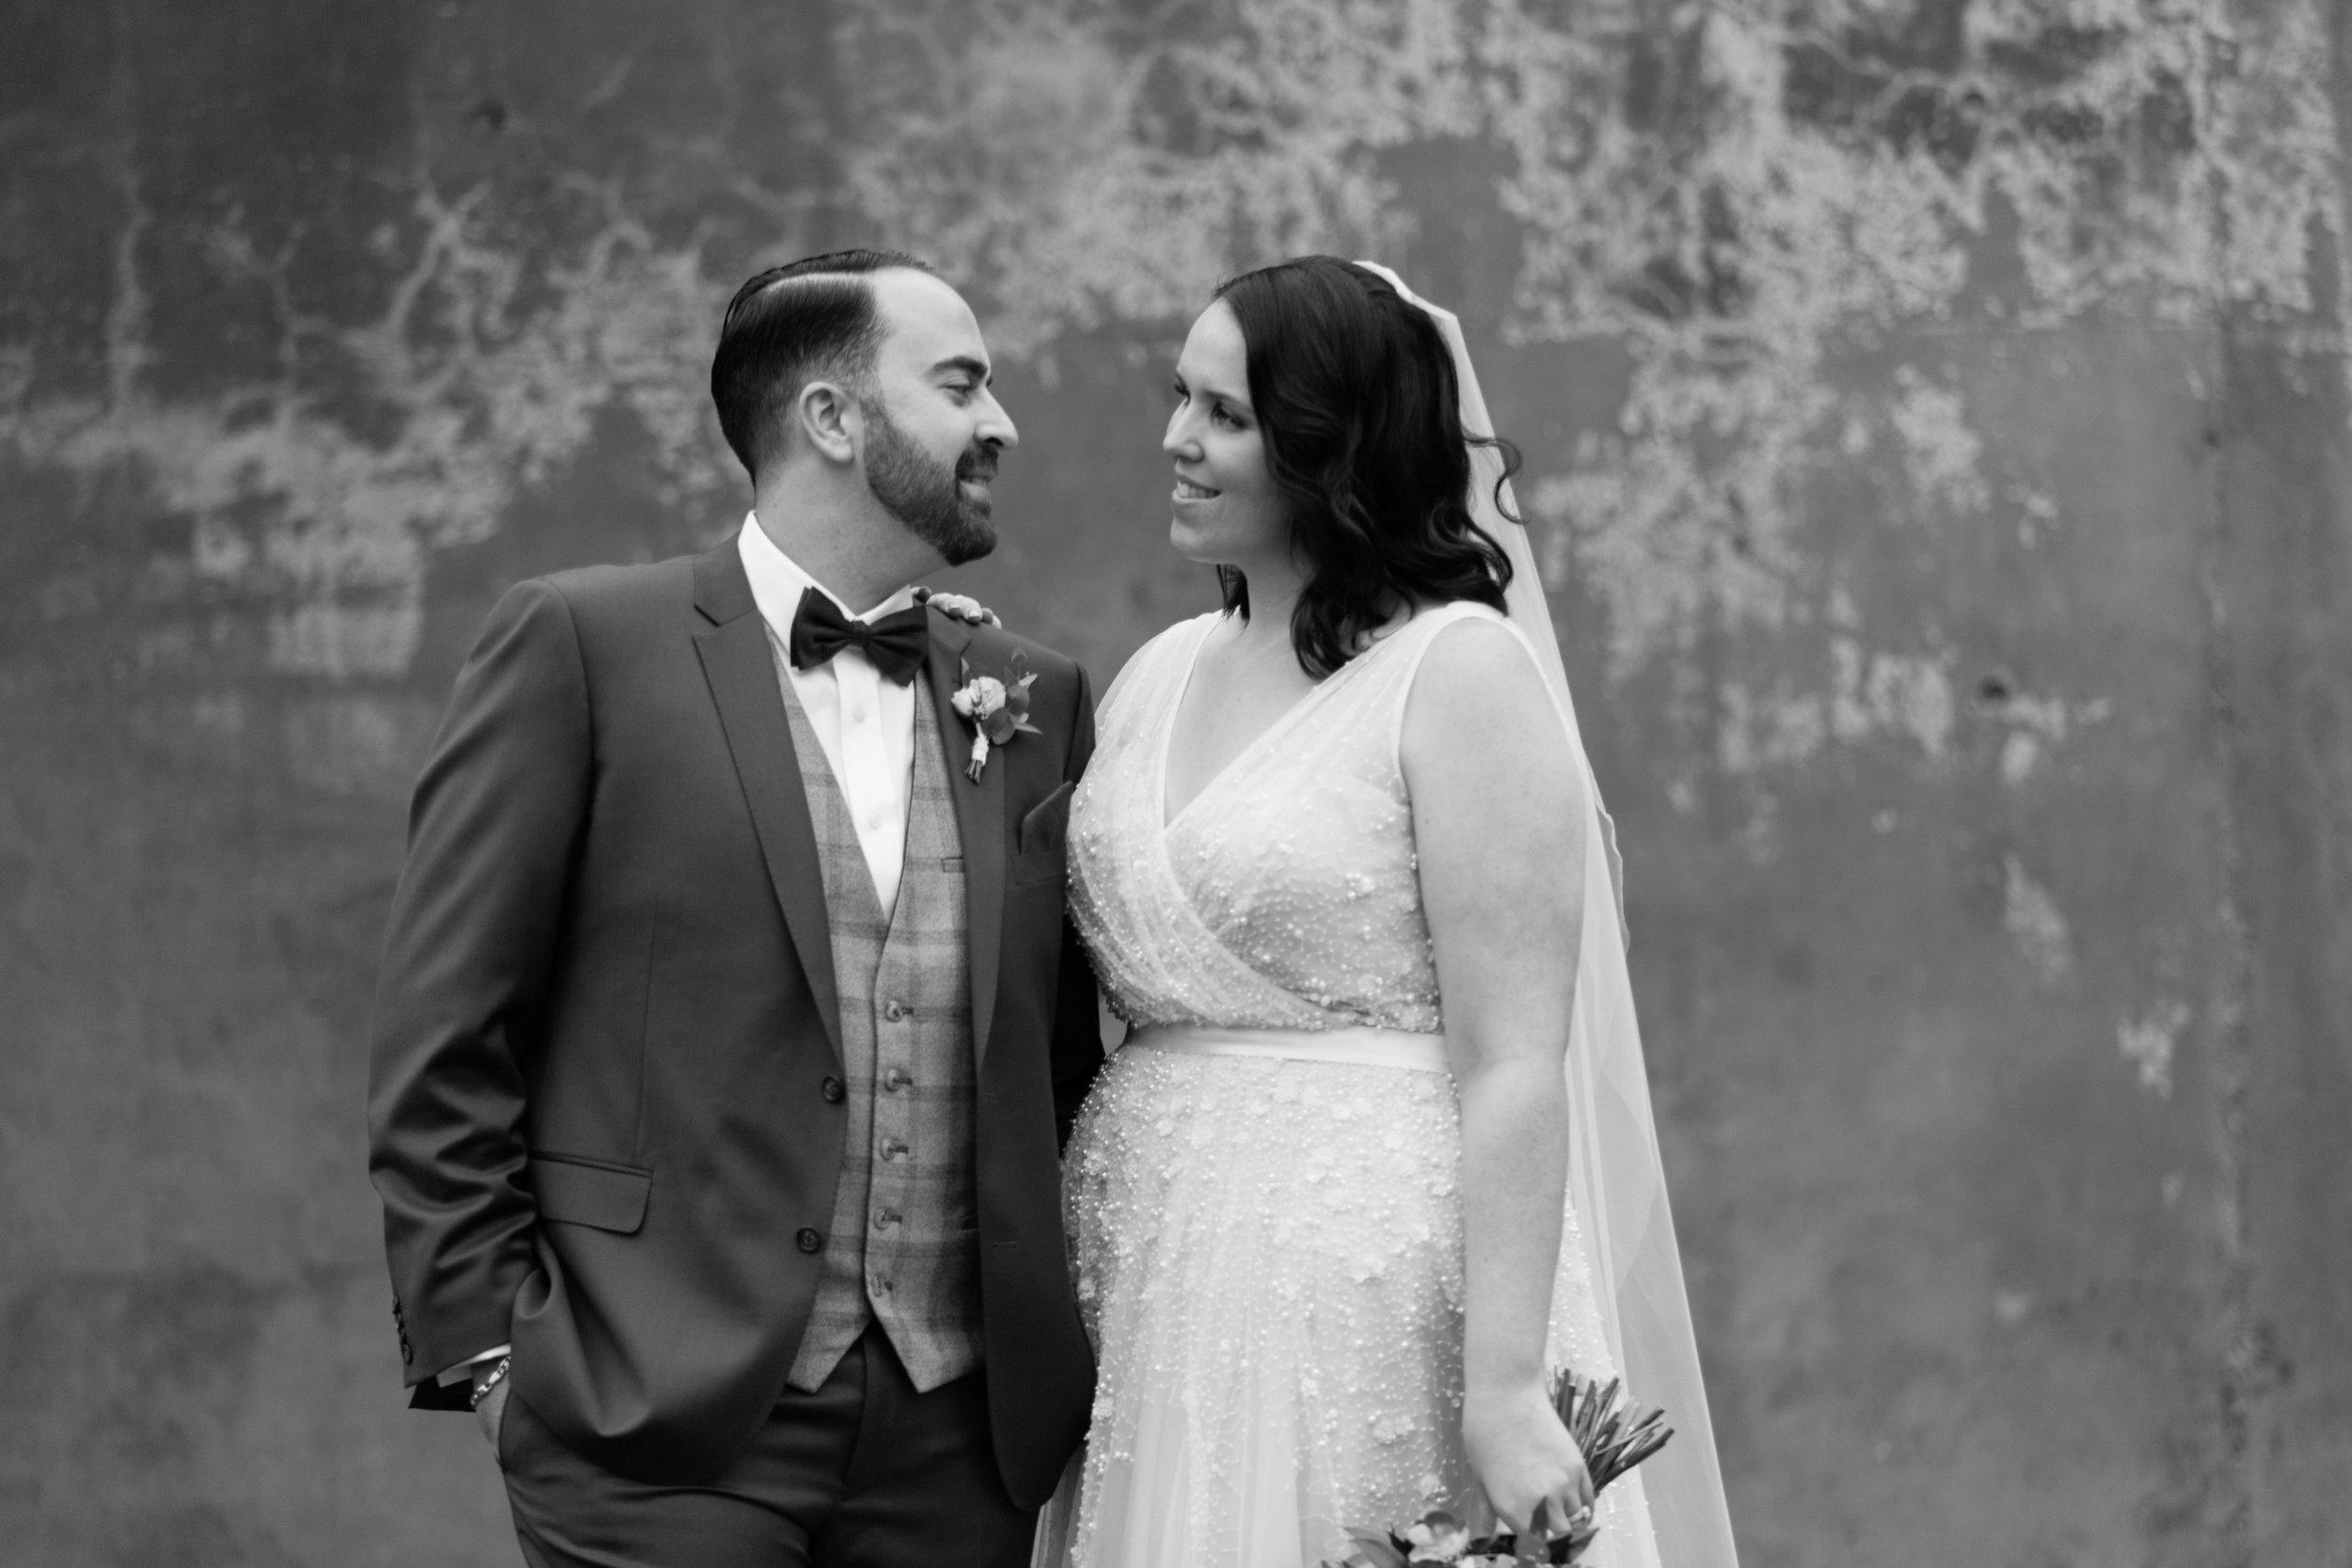 brisbane-city-wedding-photographer-romantic-wedding-68.jpg